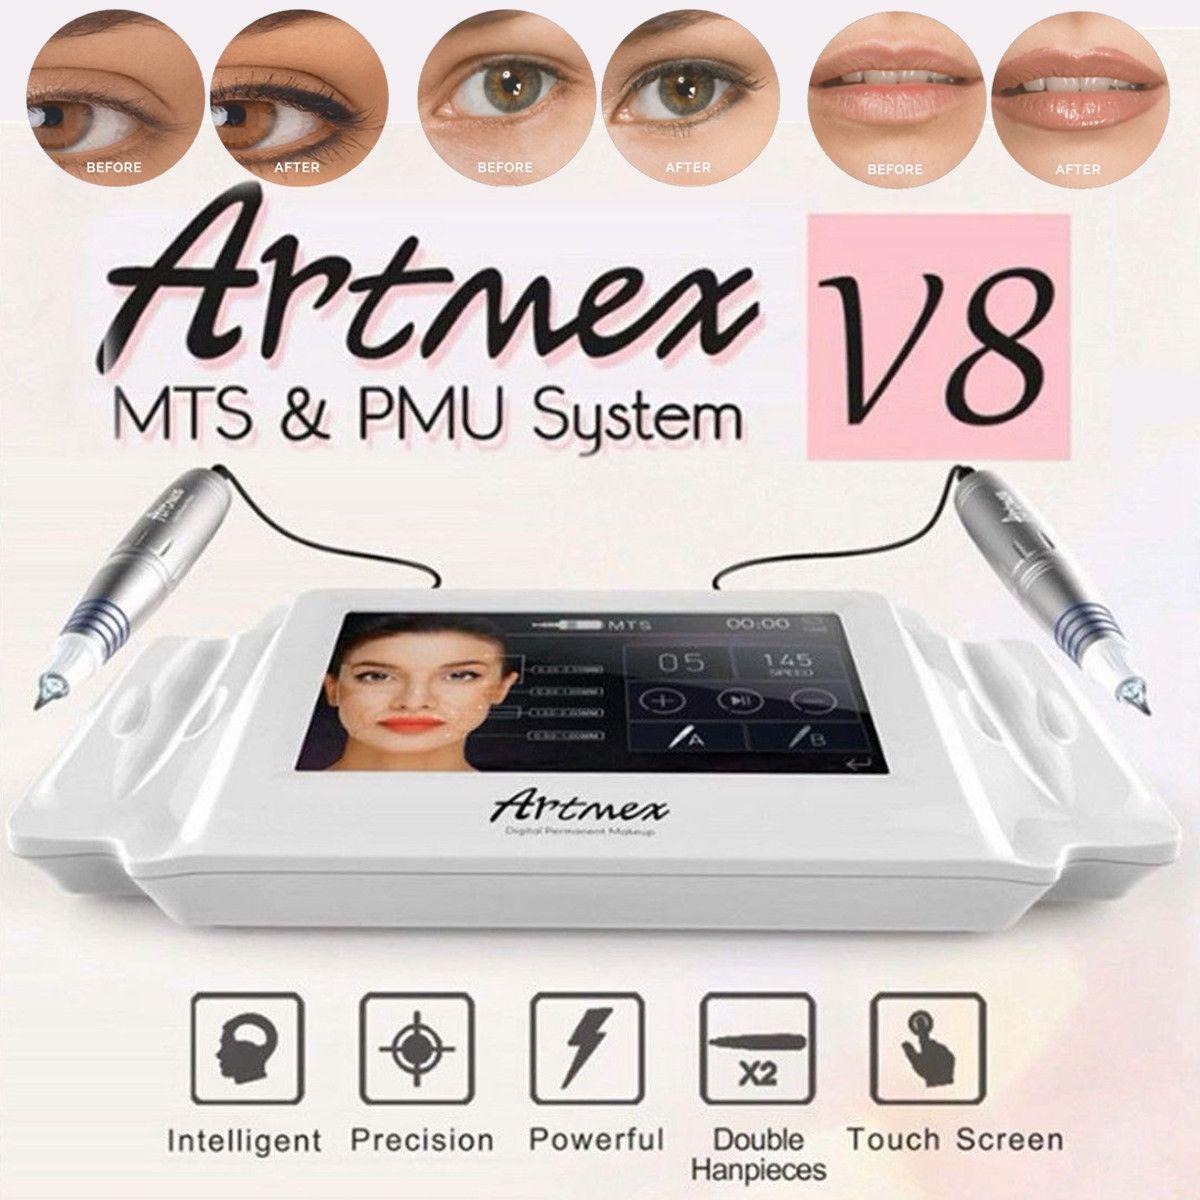 Artmex V8 Permanent Make-Up Tattoo Maschine Augenbraue Eyeliner Lippen MTS Tattoo Guns Gesichts Therapie Anti Alterung Tattoo Maschinen